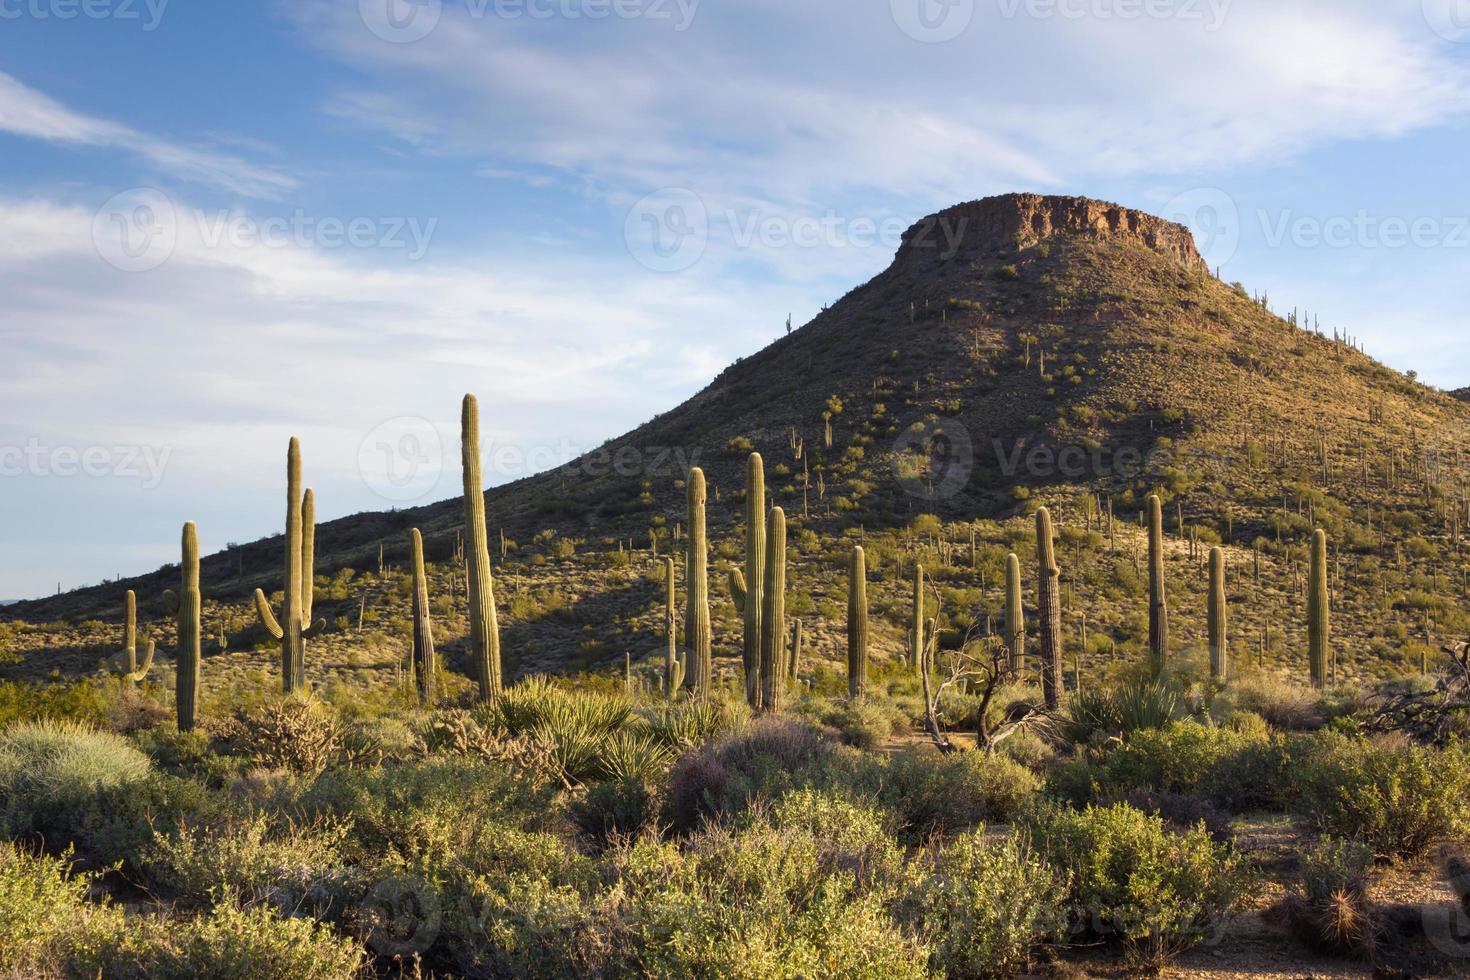 escena del desierto de la mañana en arizona foto